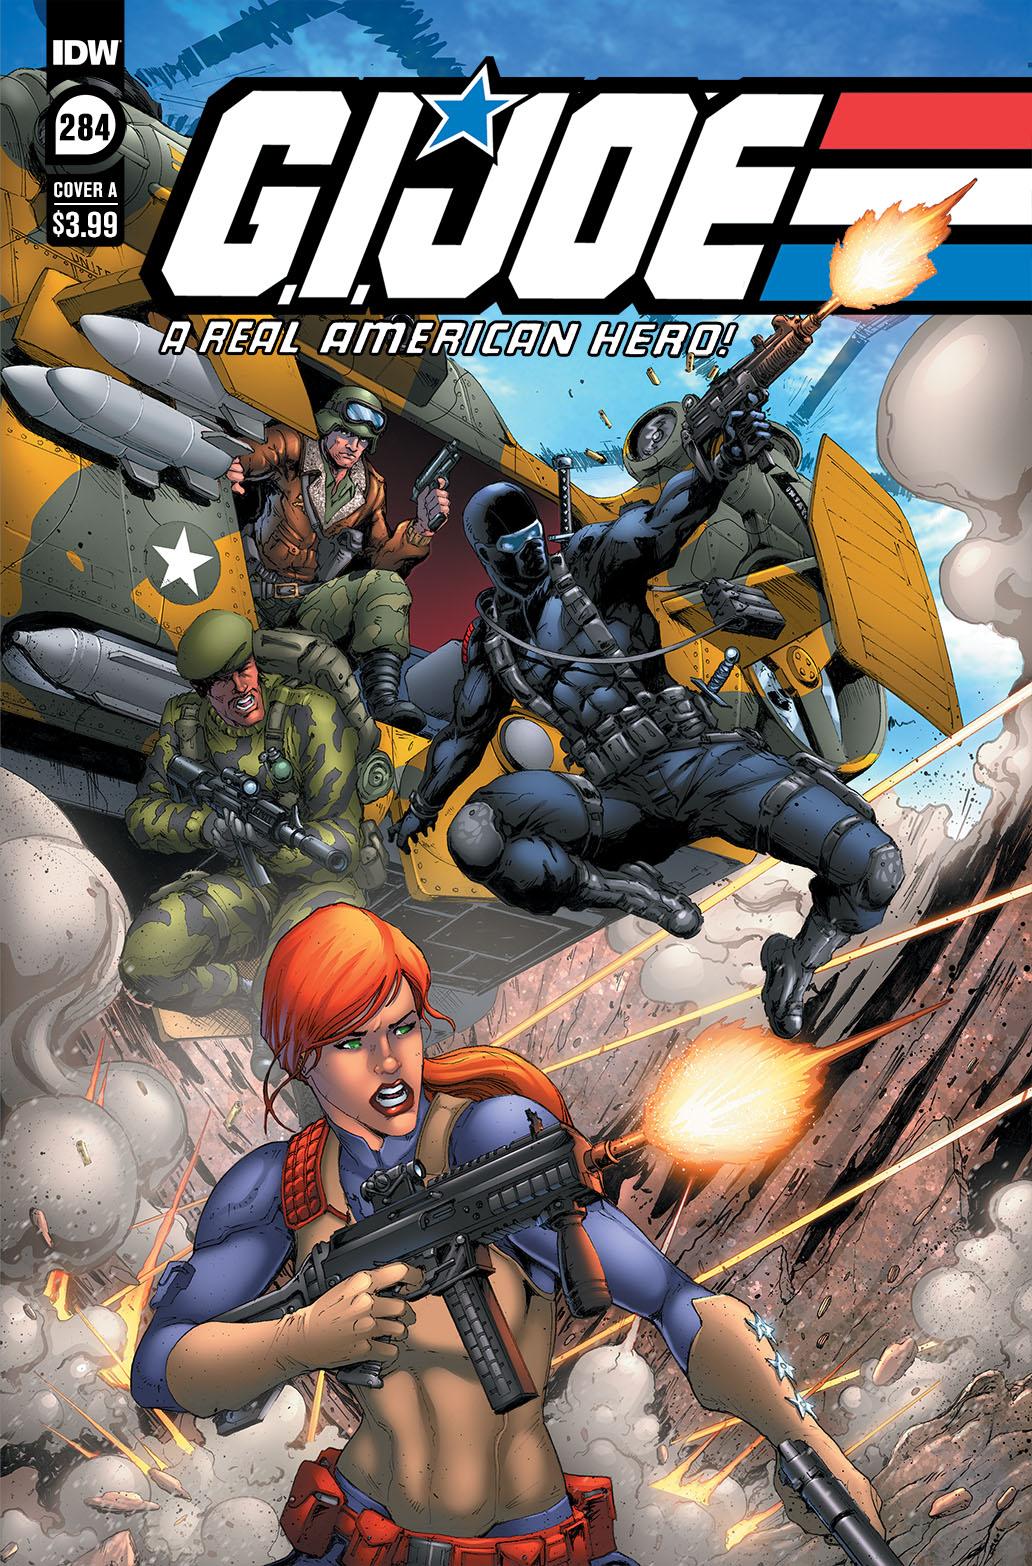 GIJoeRAH284-coverA-copy IDW Publishing June 2021 Solicitations